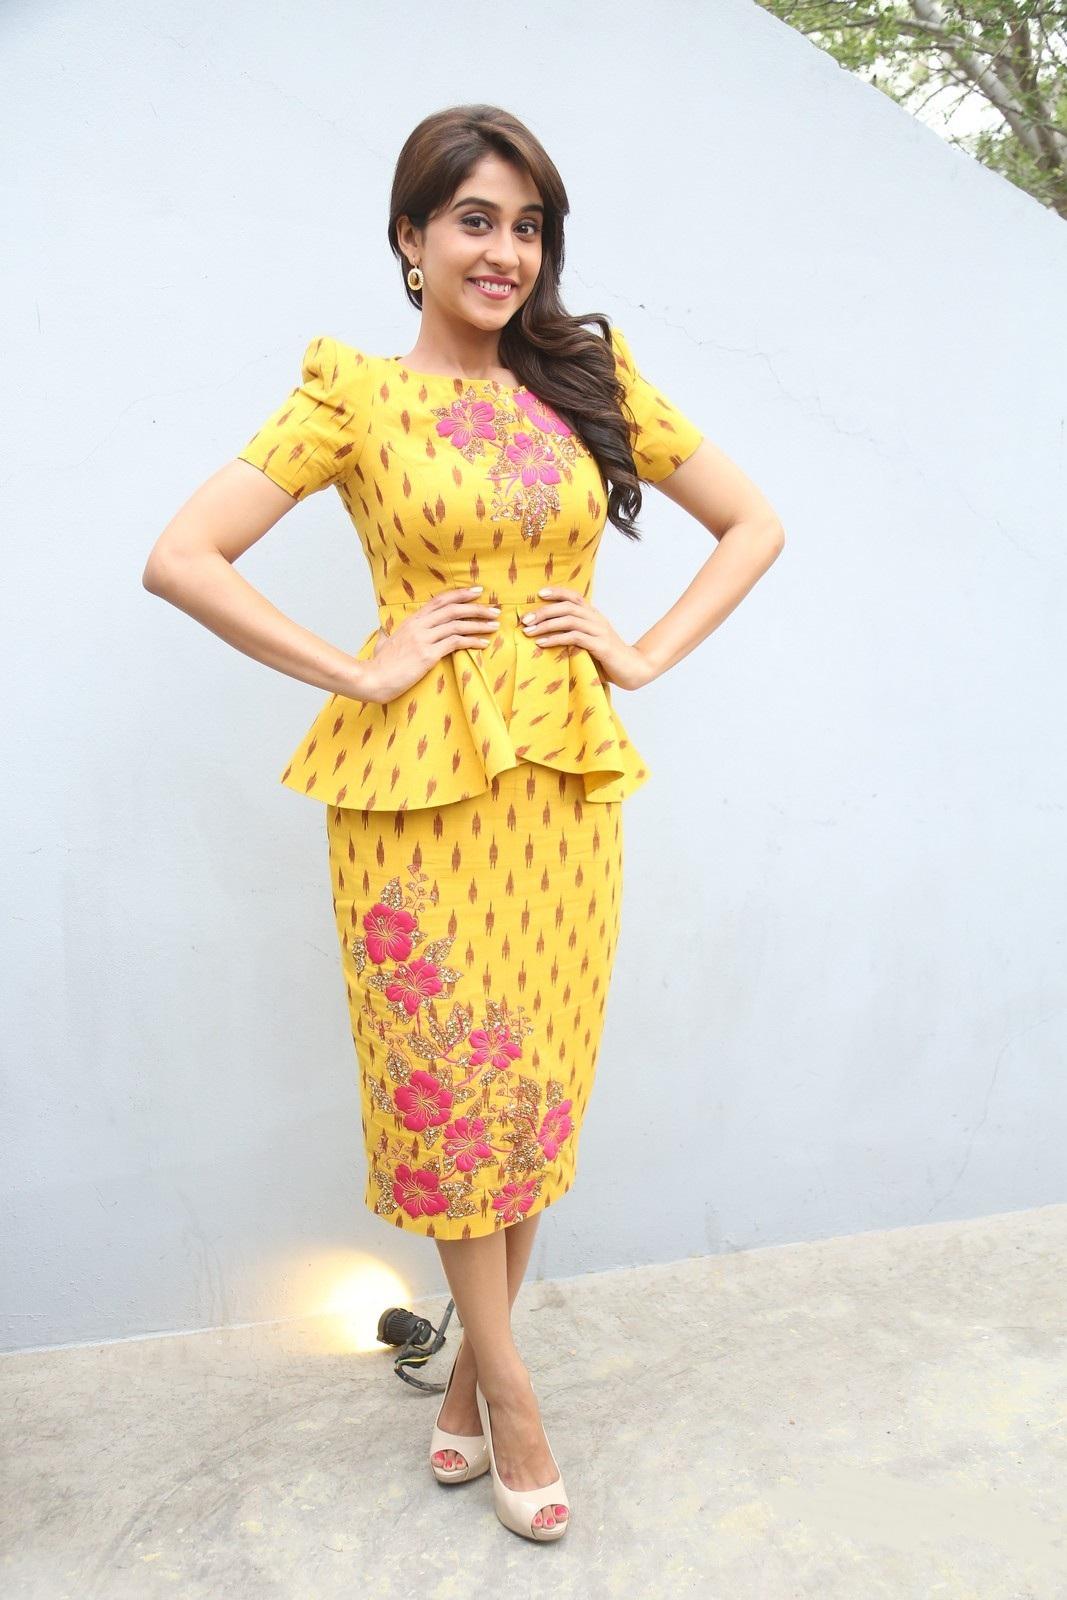 Neelam Fashions New York Dress at New York Fashion